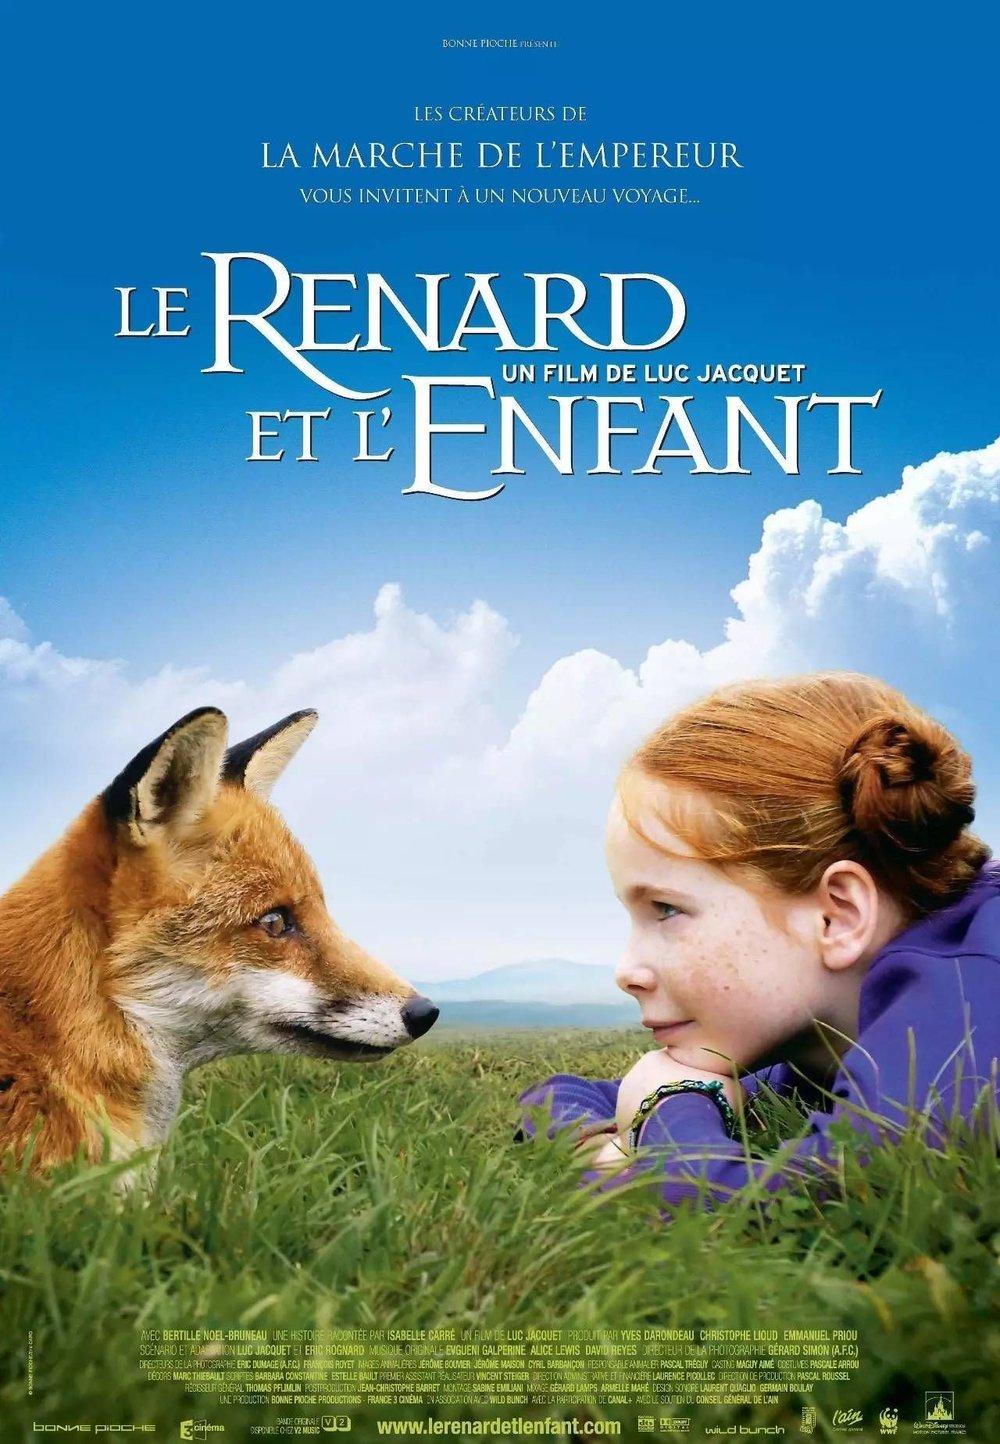 Le-renard.jpg